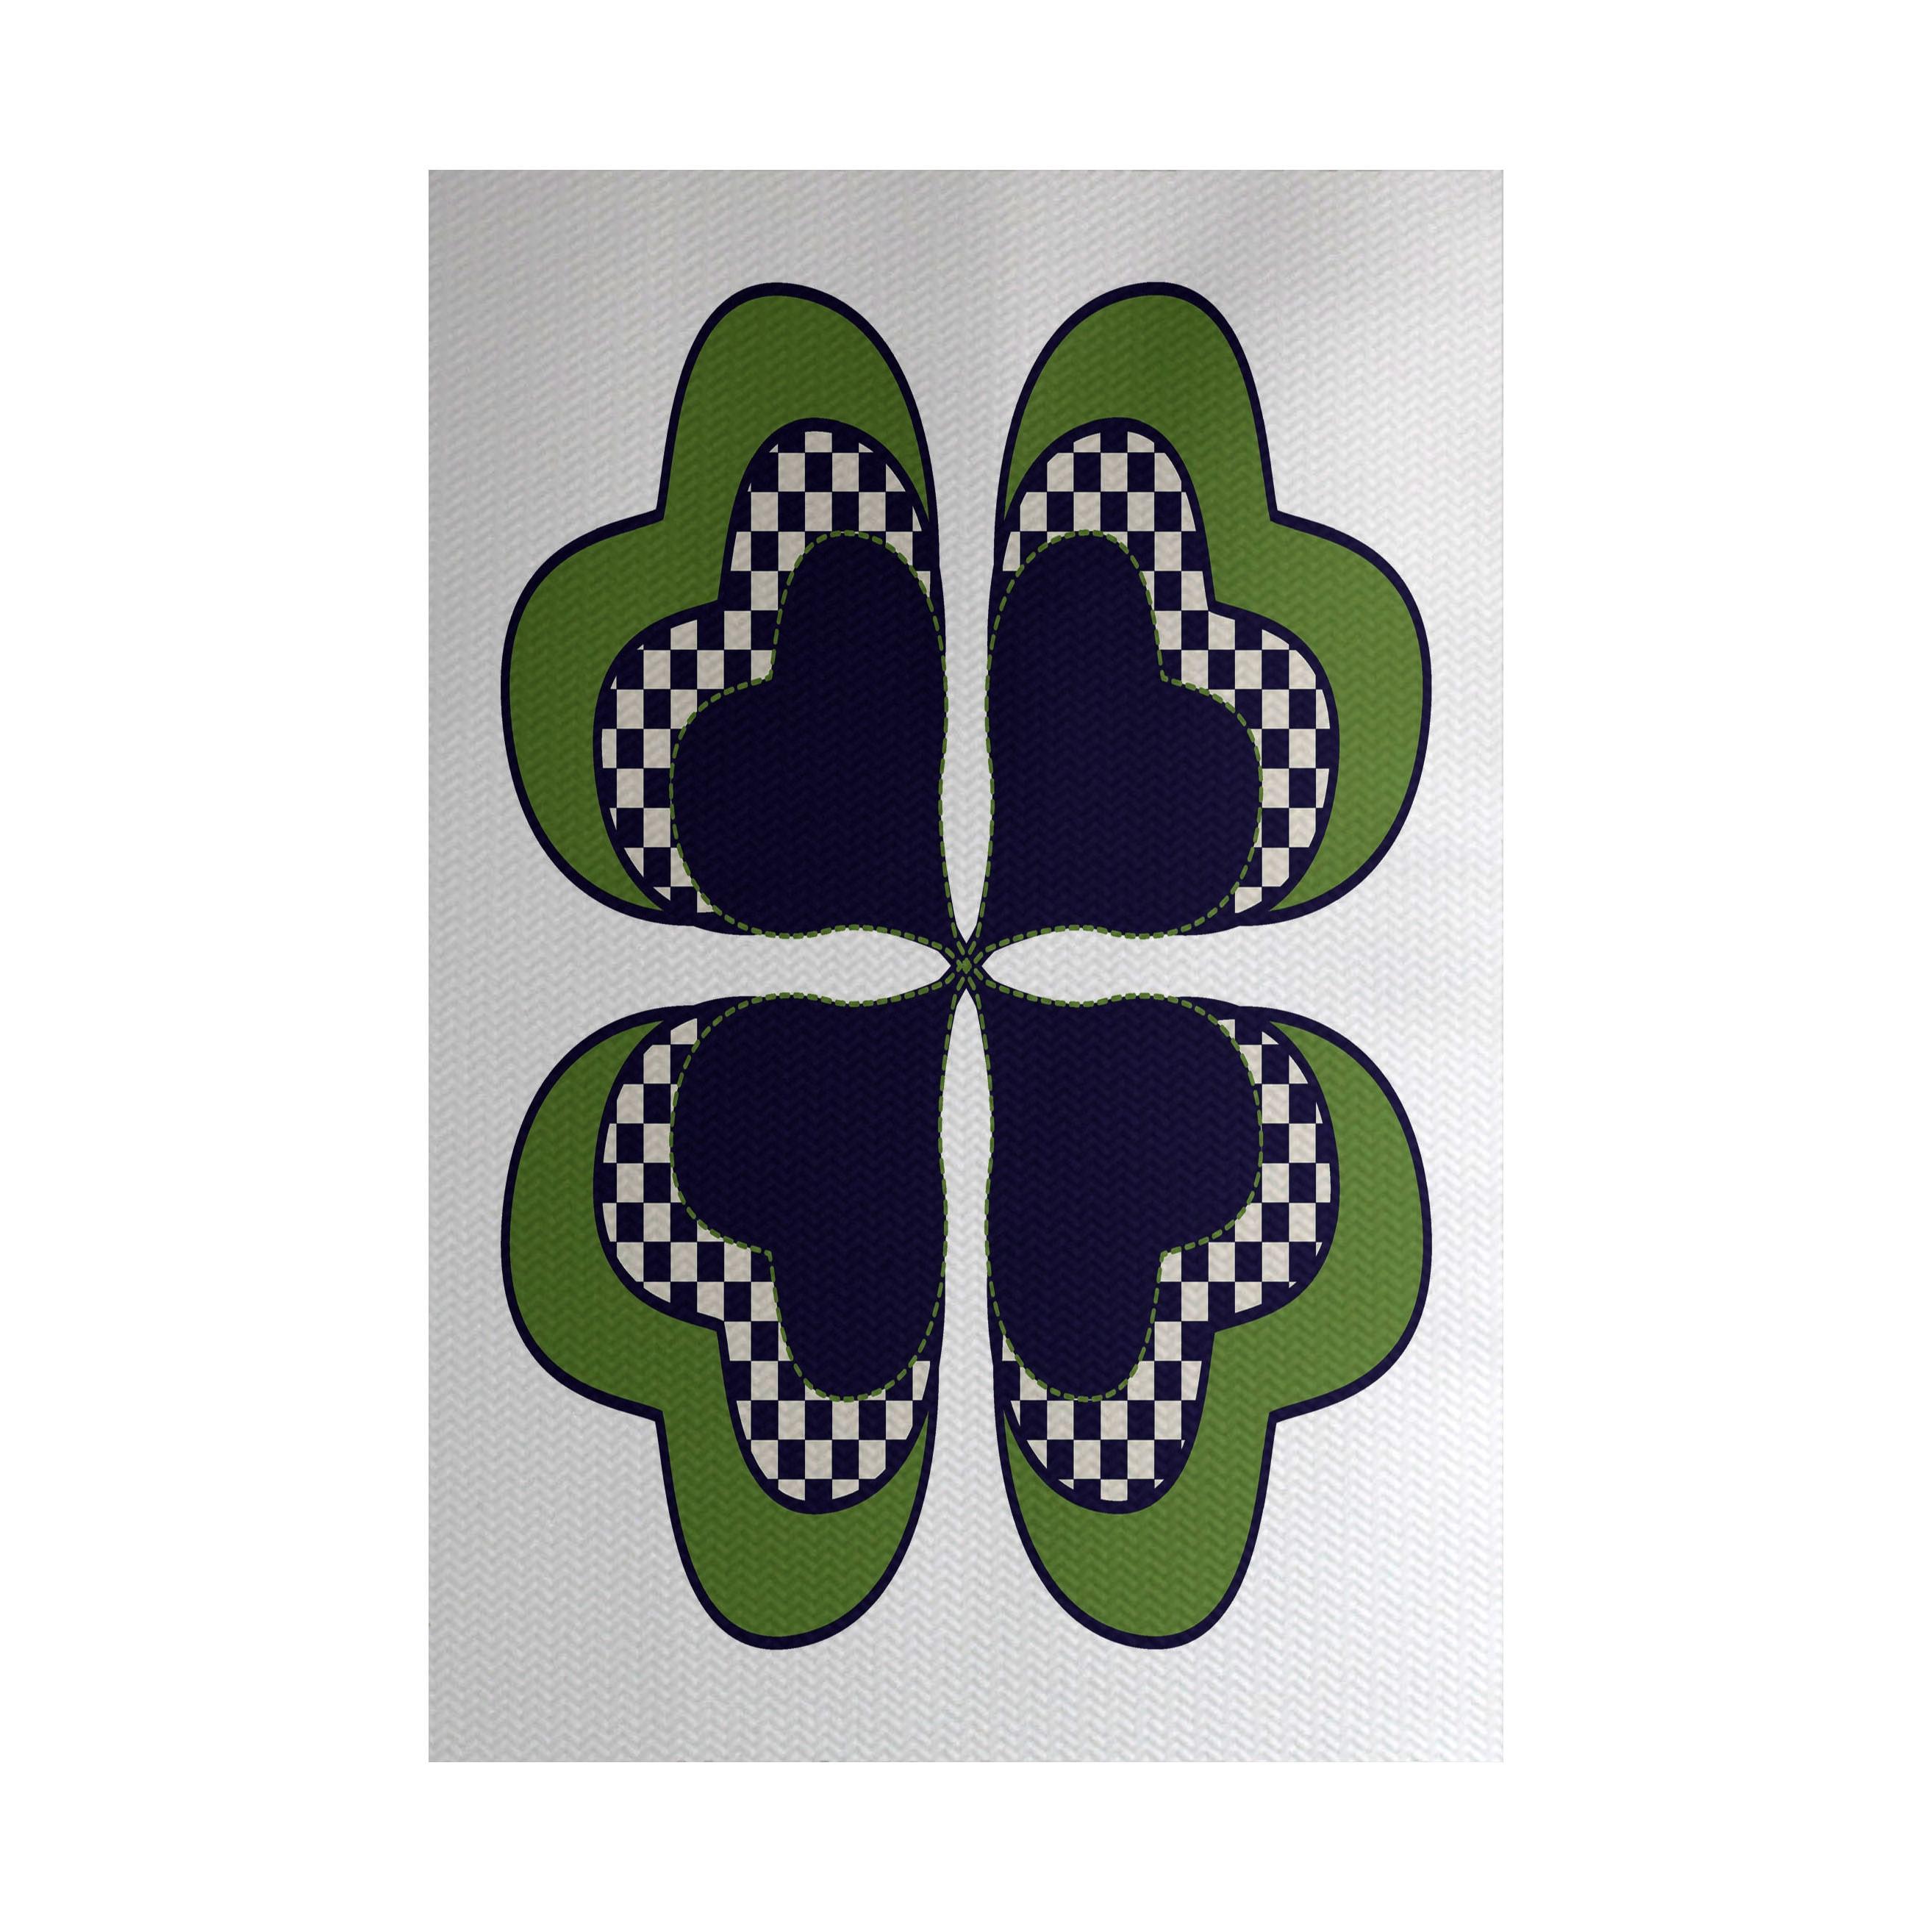 Four Leaf Clover Holiday Floral Print Indoor Outdoor Rug 2 X 3